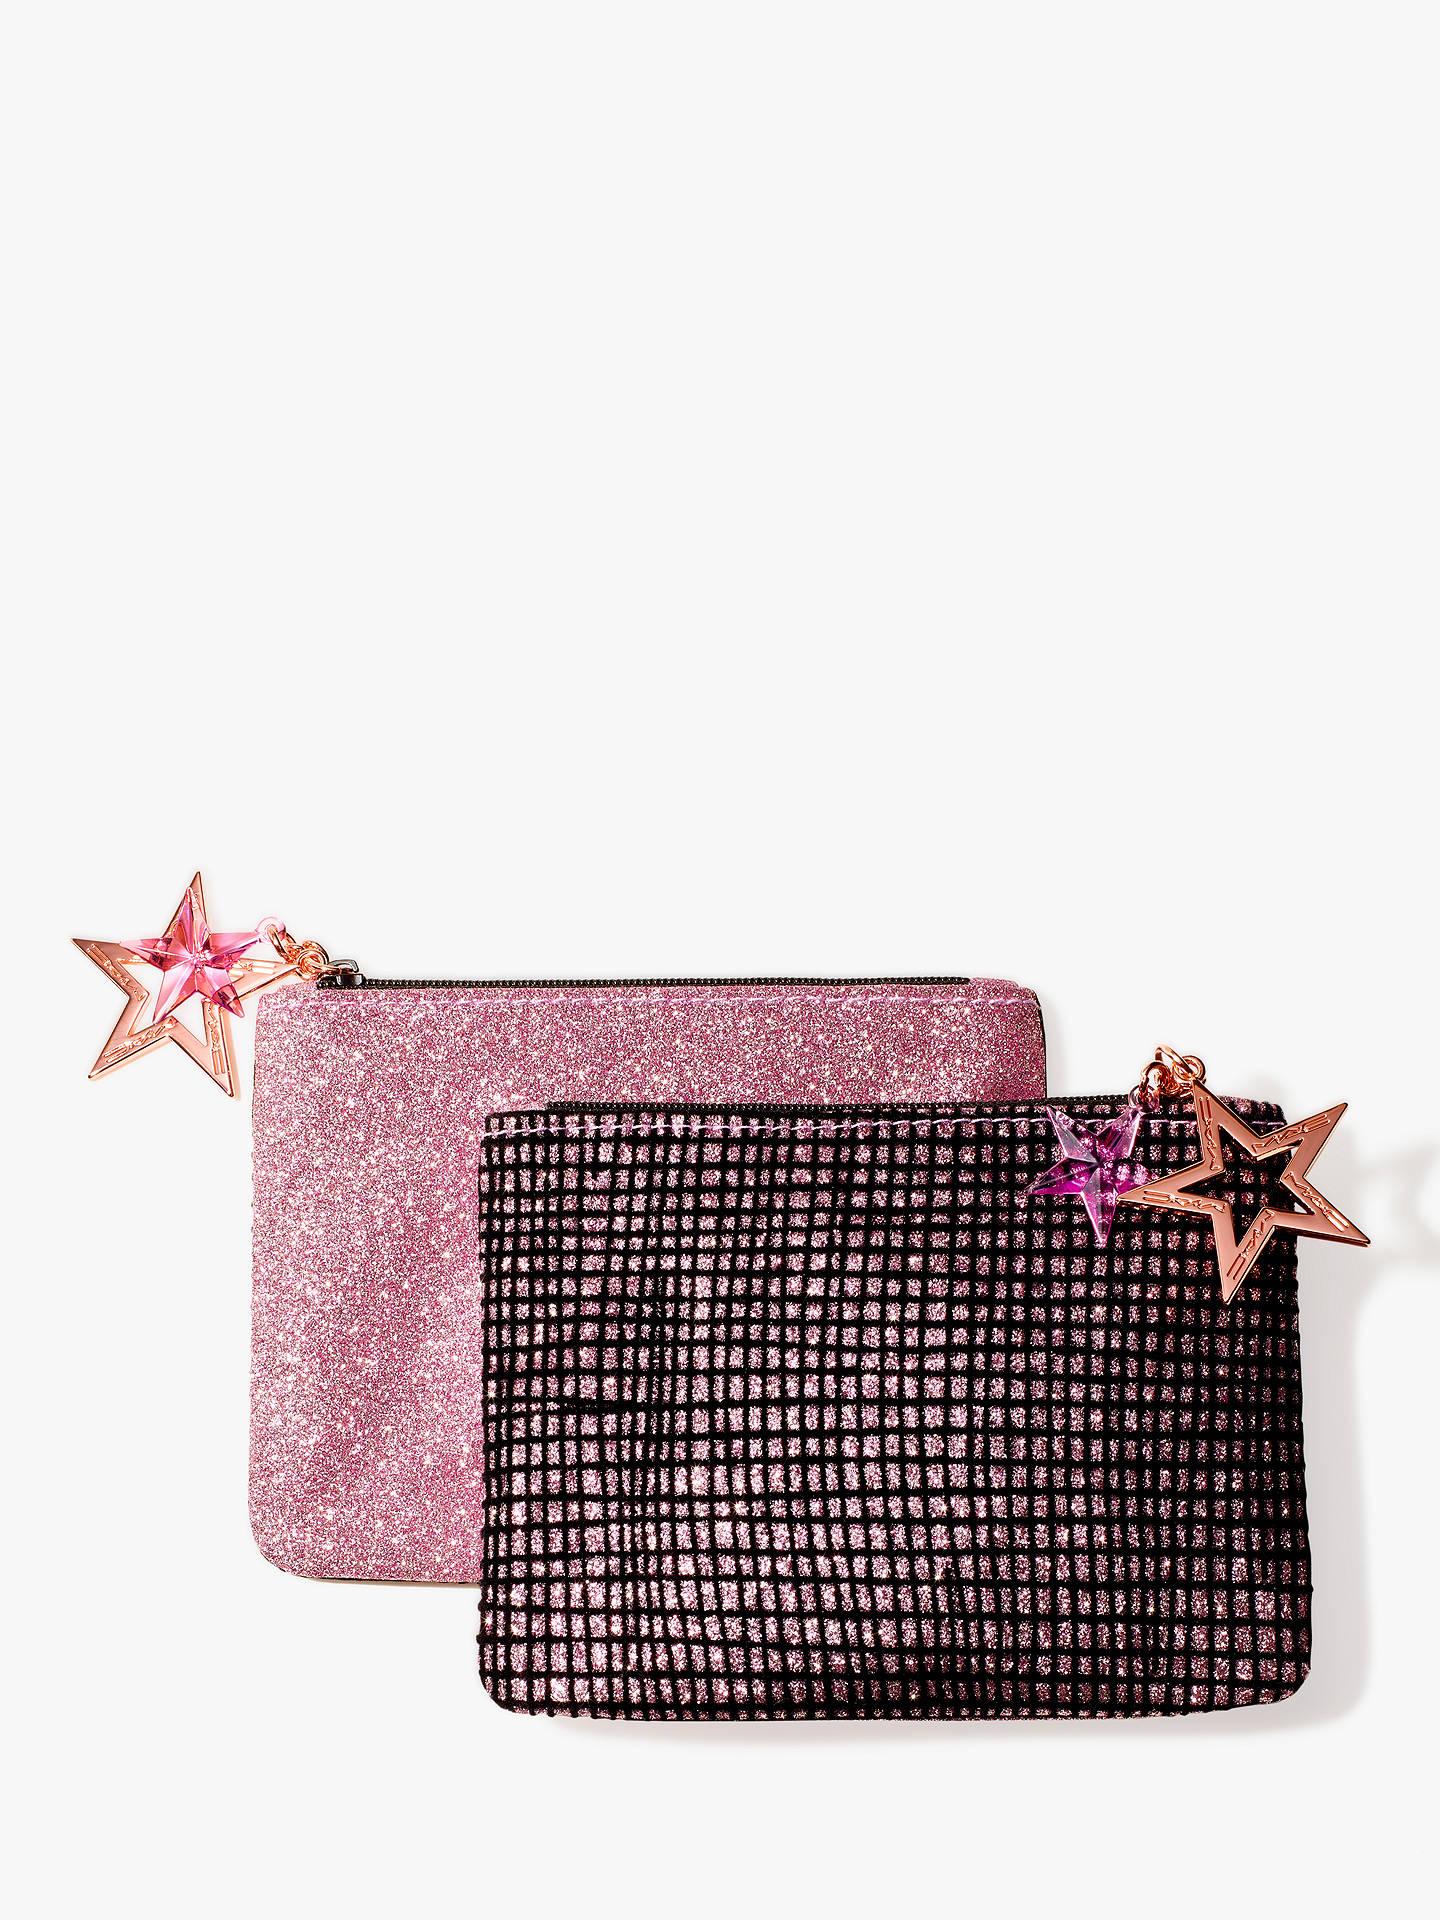 MAC Lucky Stars Lipstick Kit, Vibrant, Makeup Gift Set